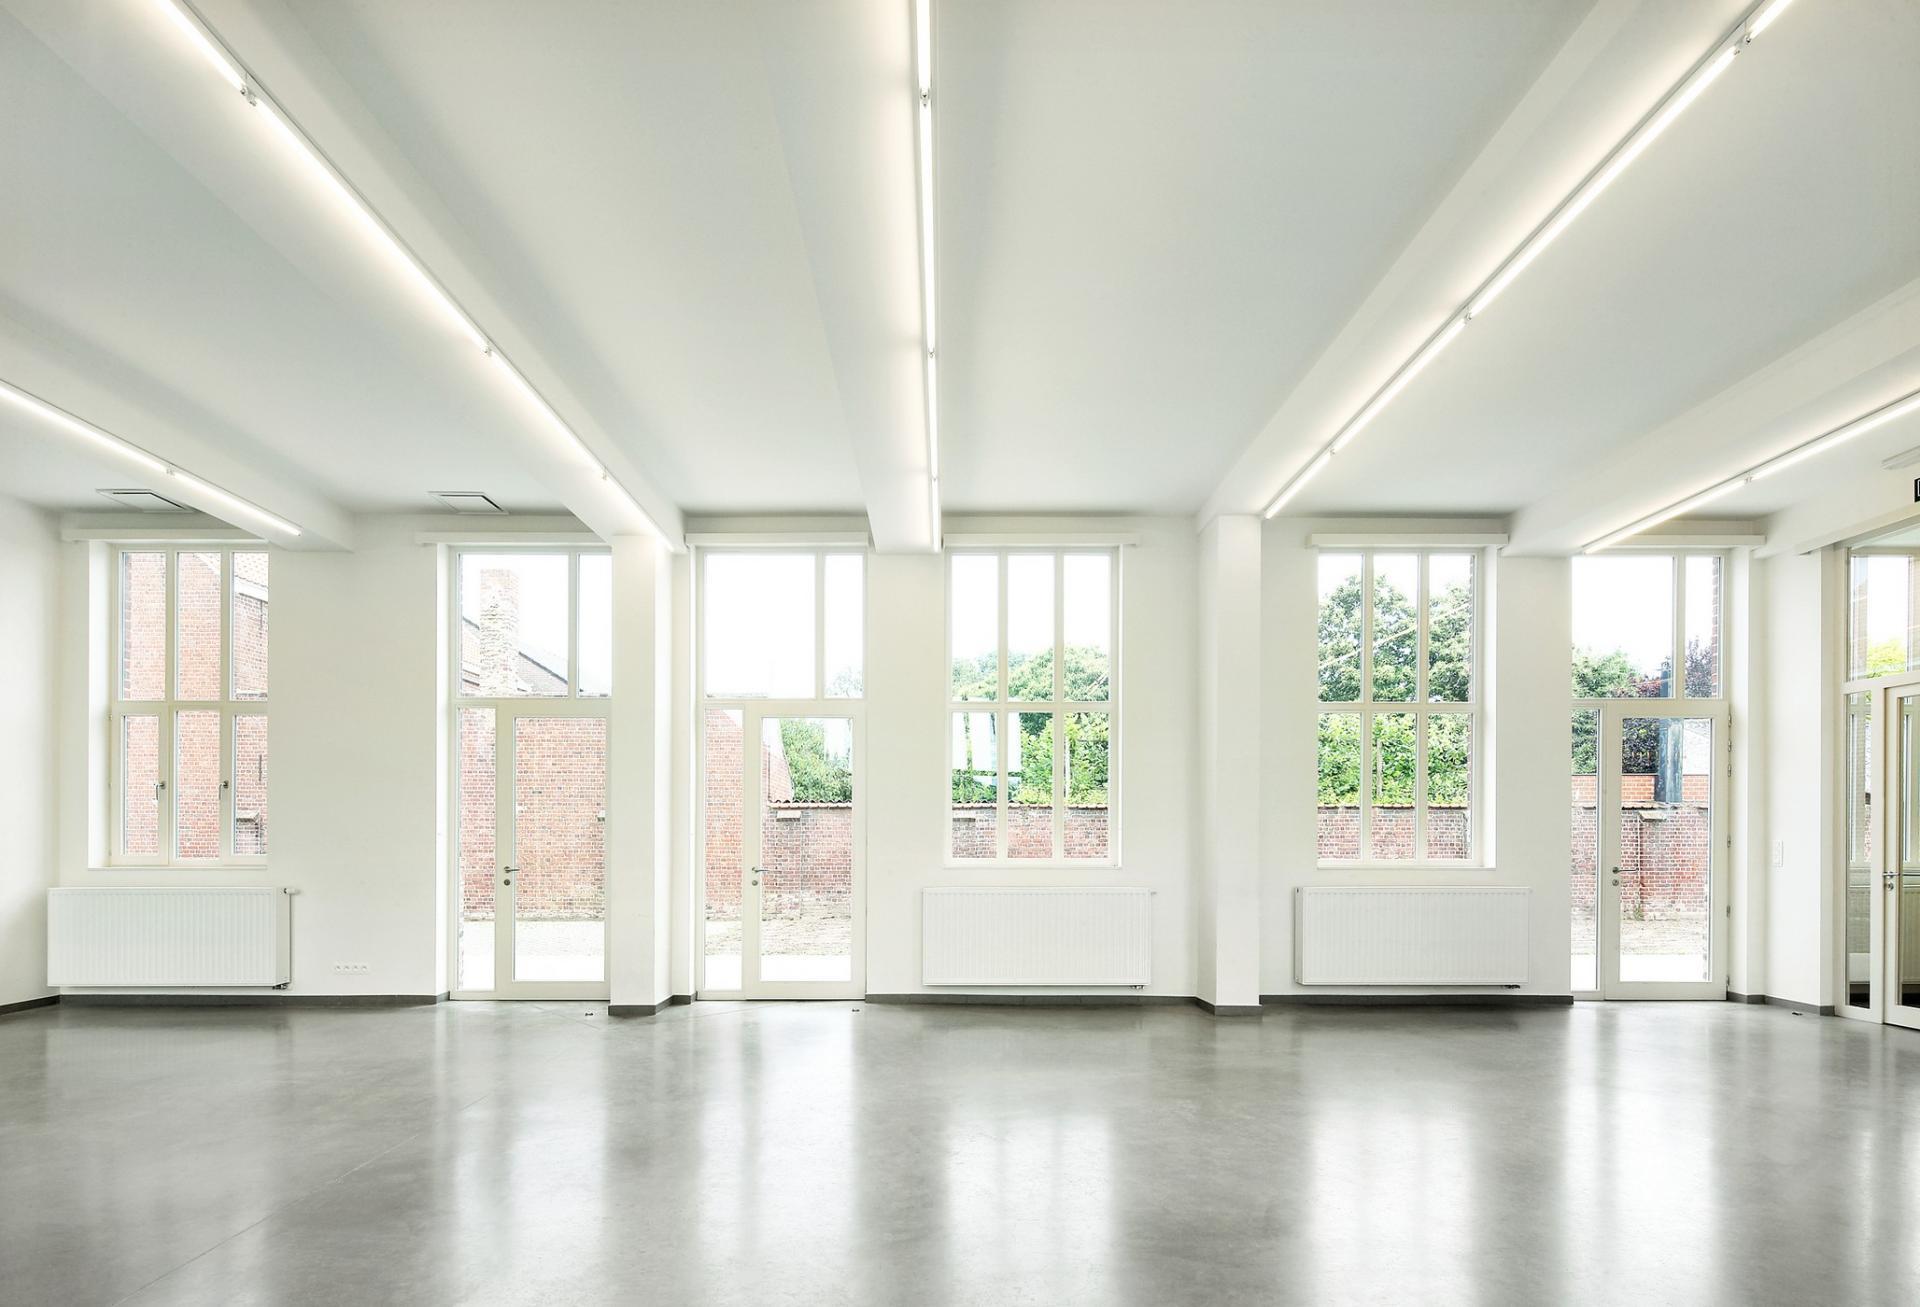 Cultural Centre in Woesten / Atelier Tom Vanhee